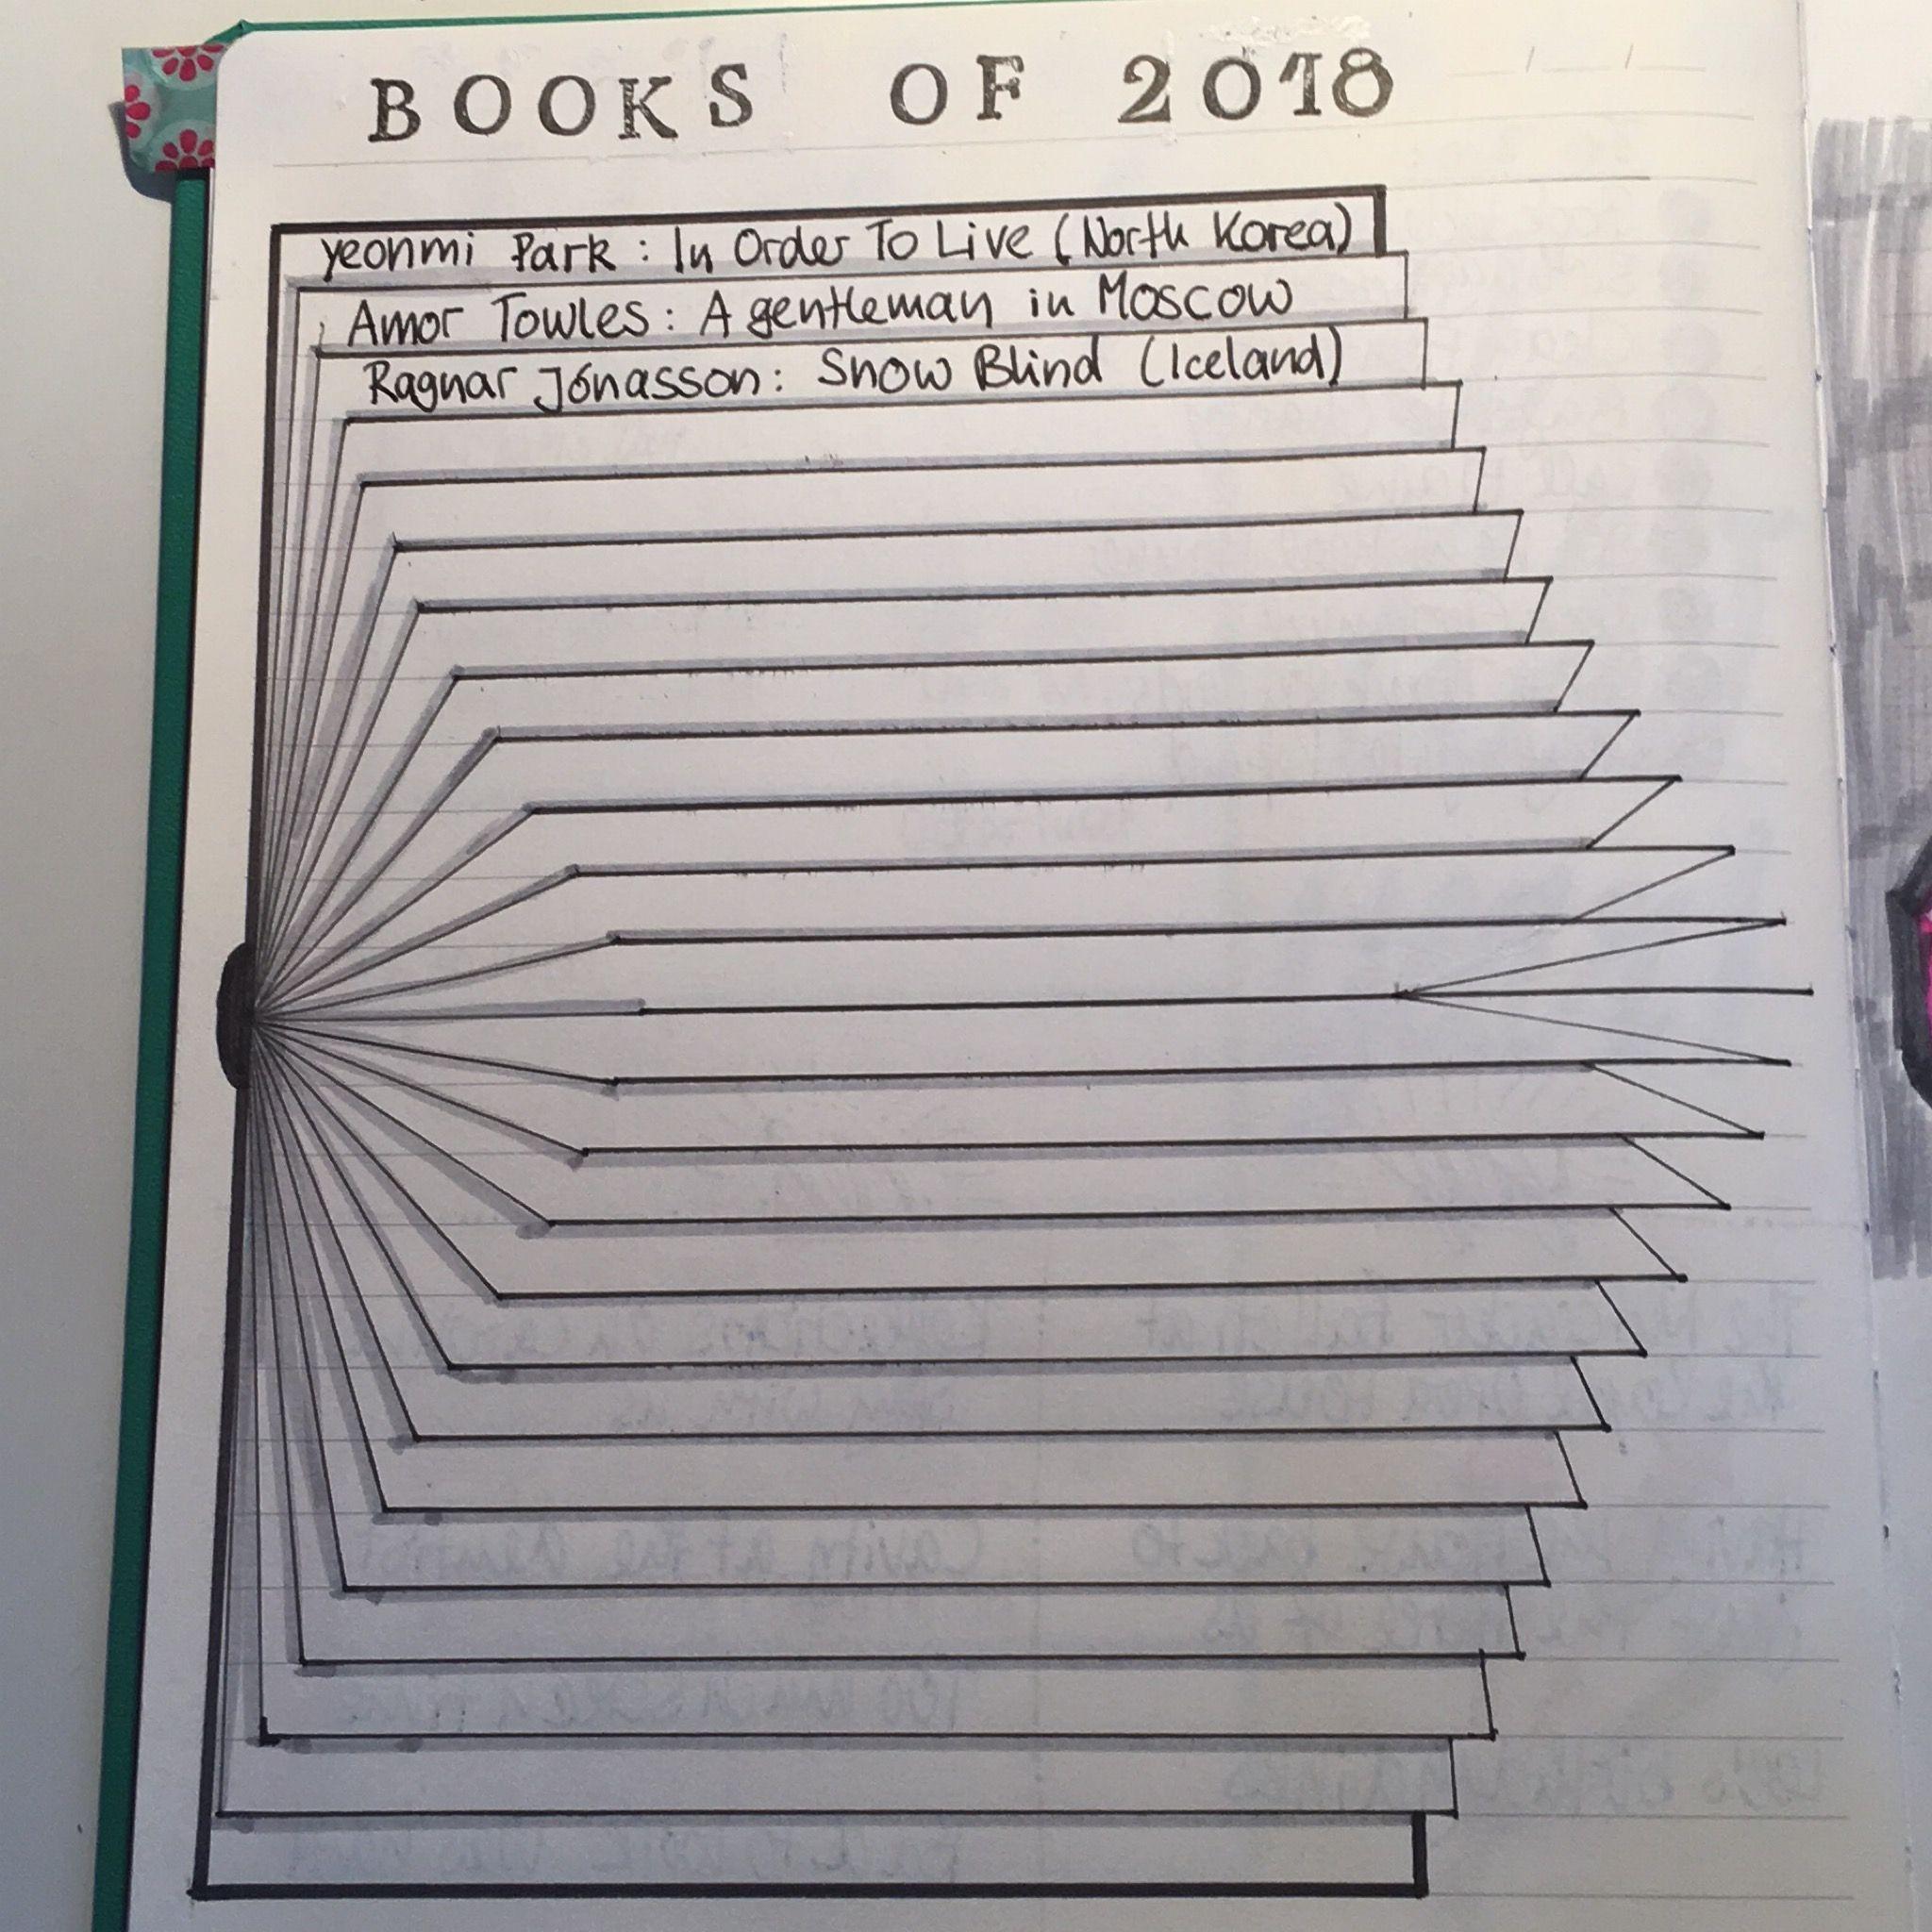 C187c51b645b273af3b5c46fa0951420 Jpg 2048 2048 Bullet Journal Books Bullet Journal Ideas Pages Bullet Journal Inspiration